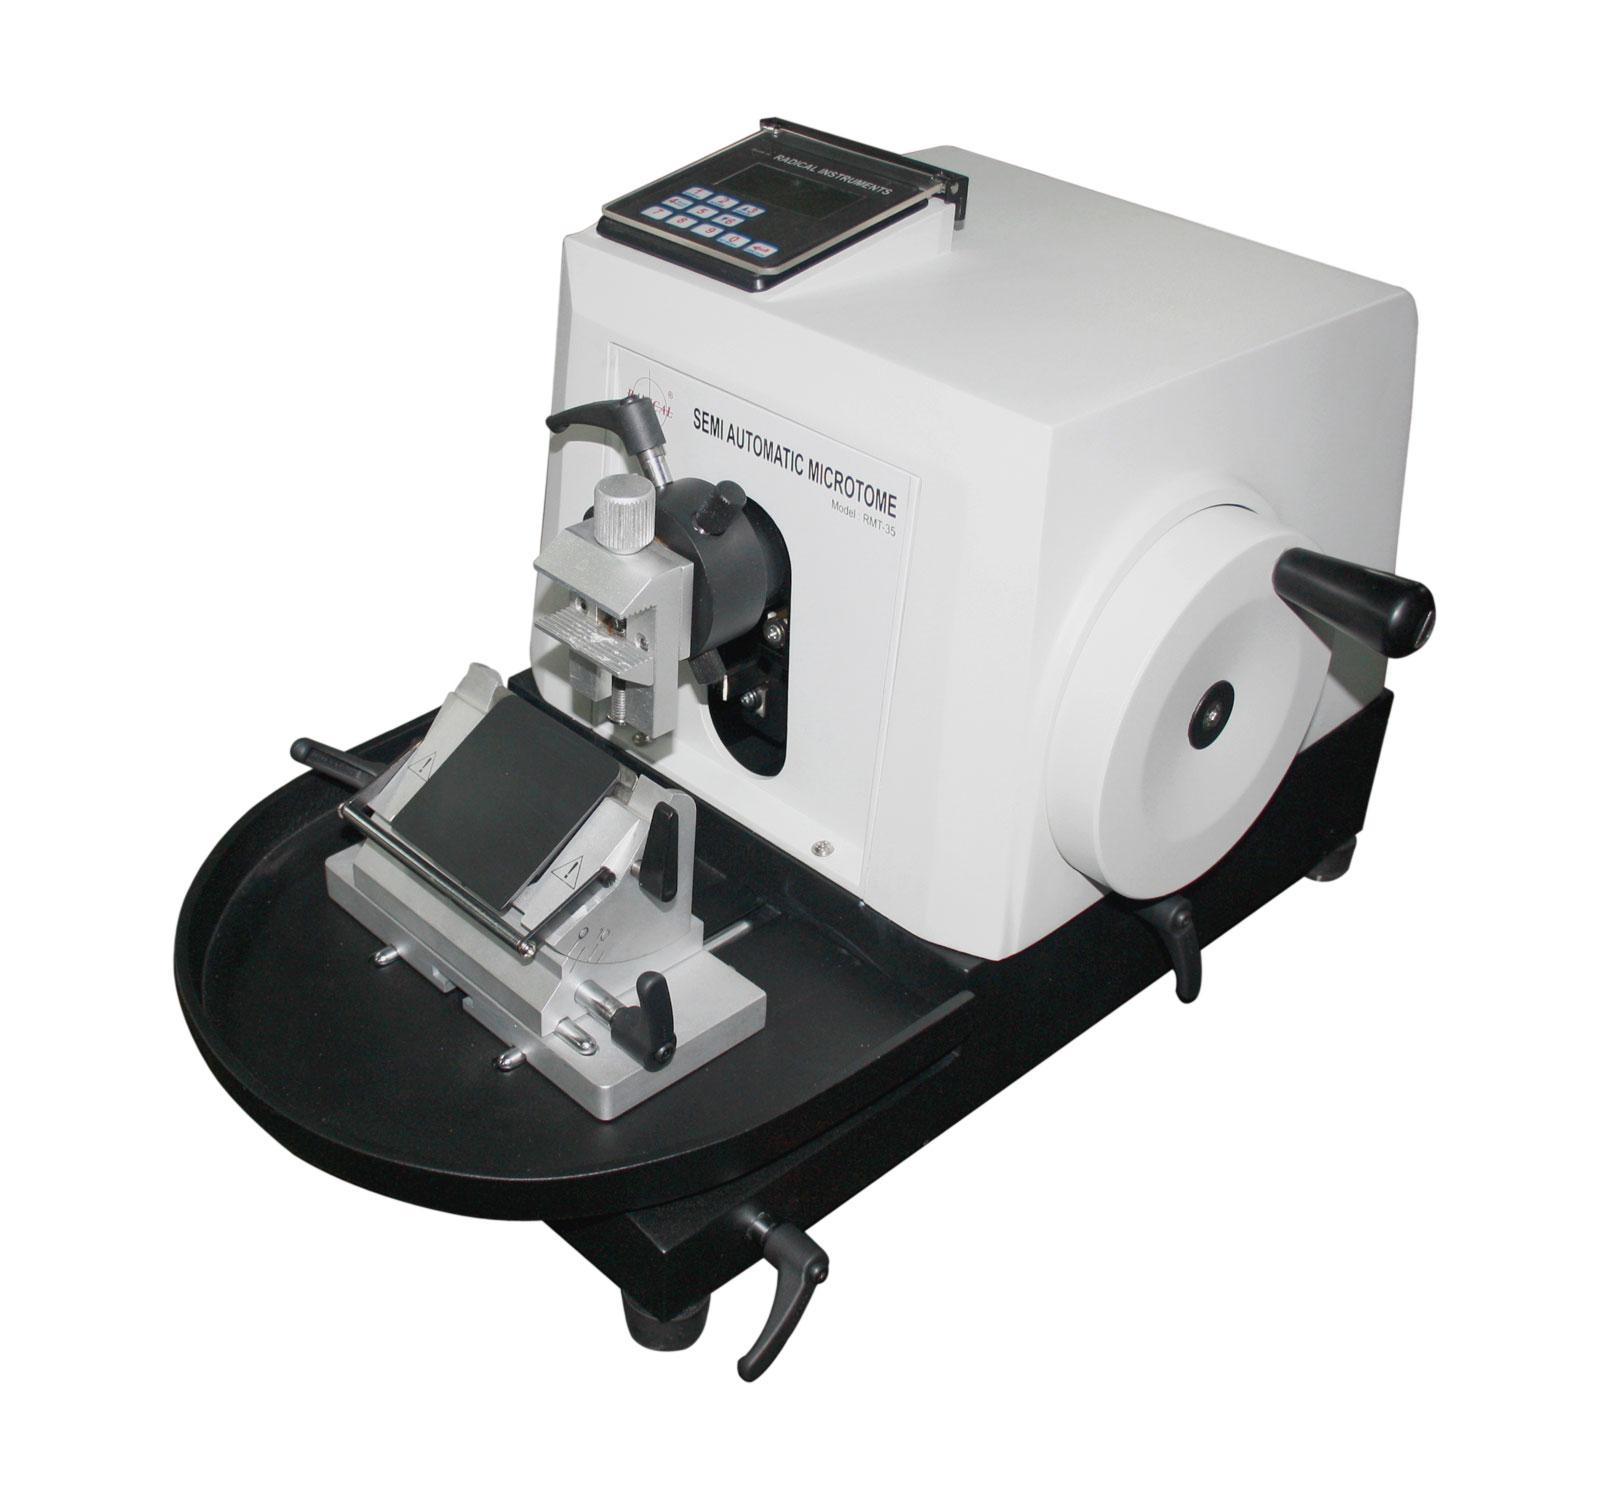 Semi Automatic Rotary Microtome - Microtomes, Histopathology Equipments